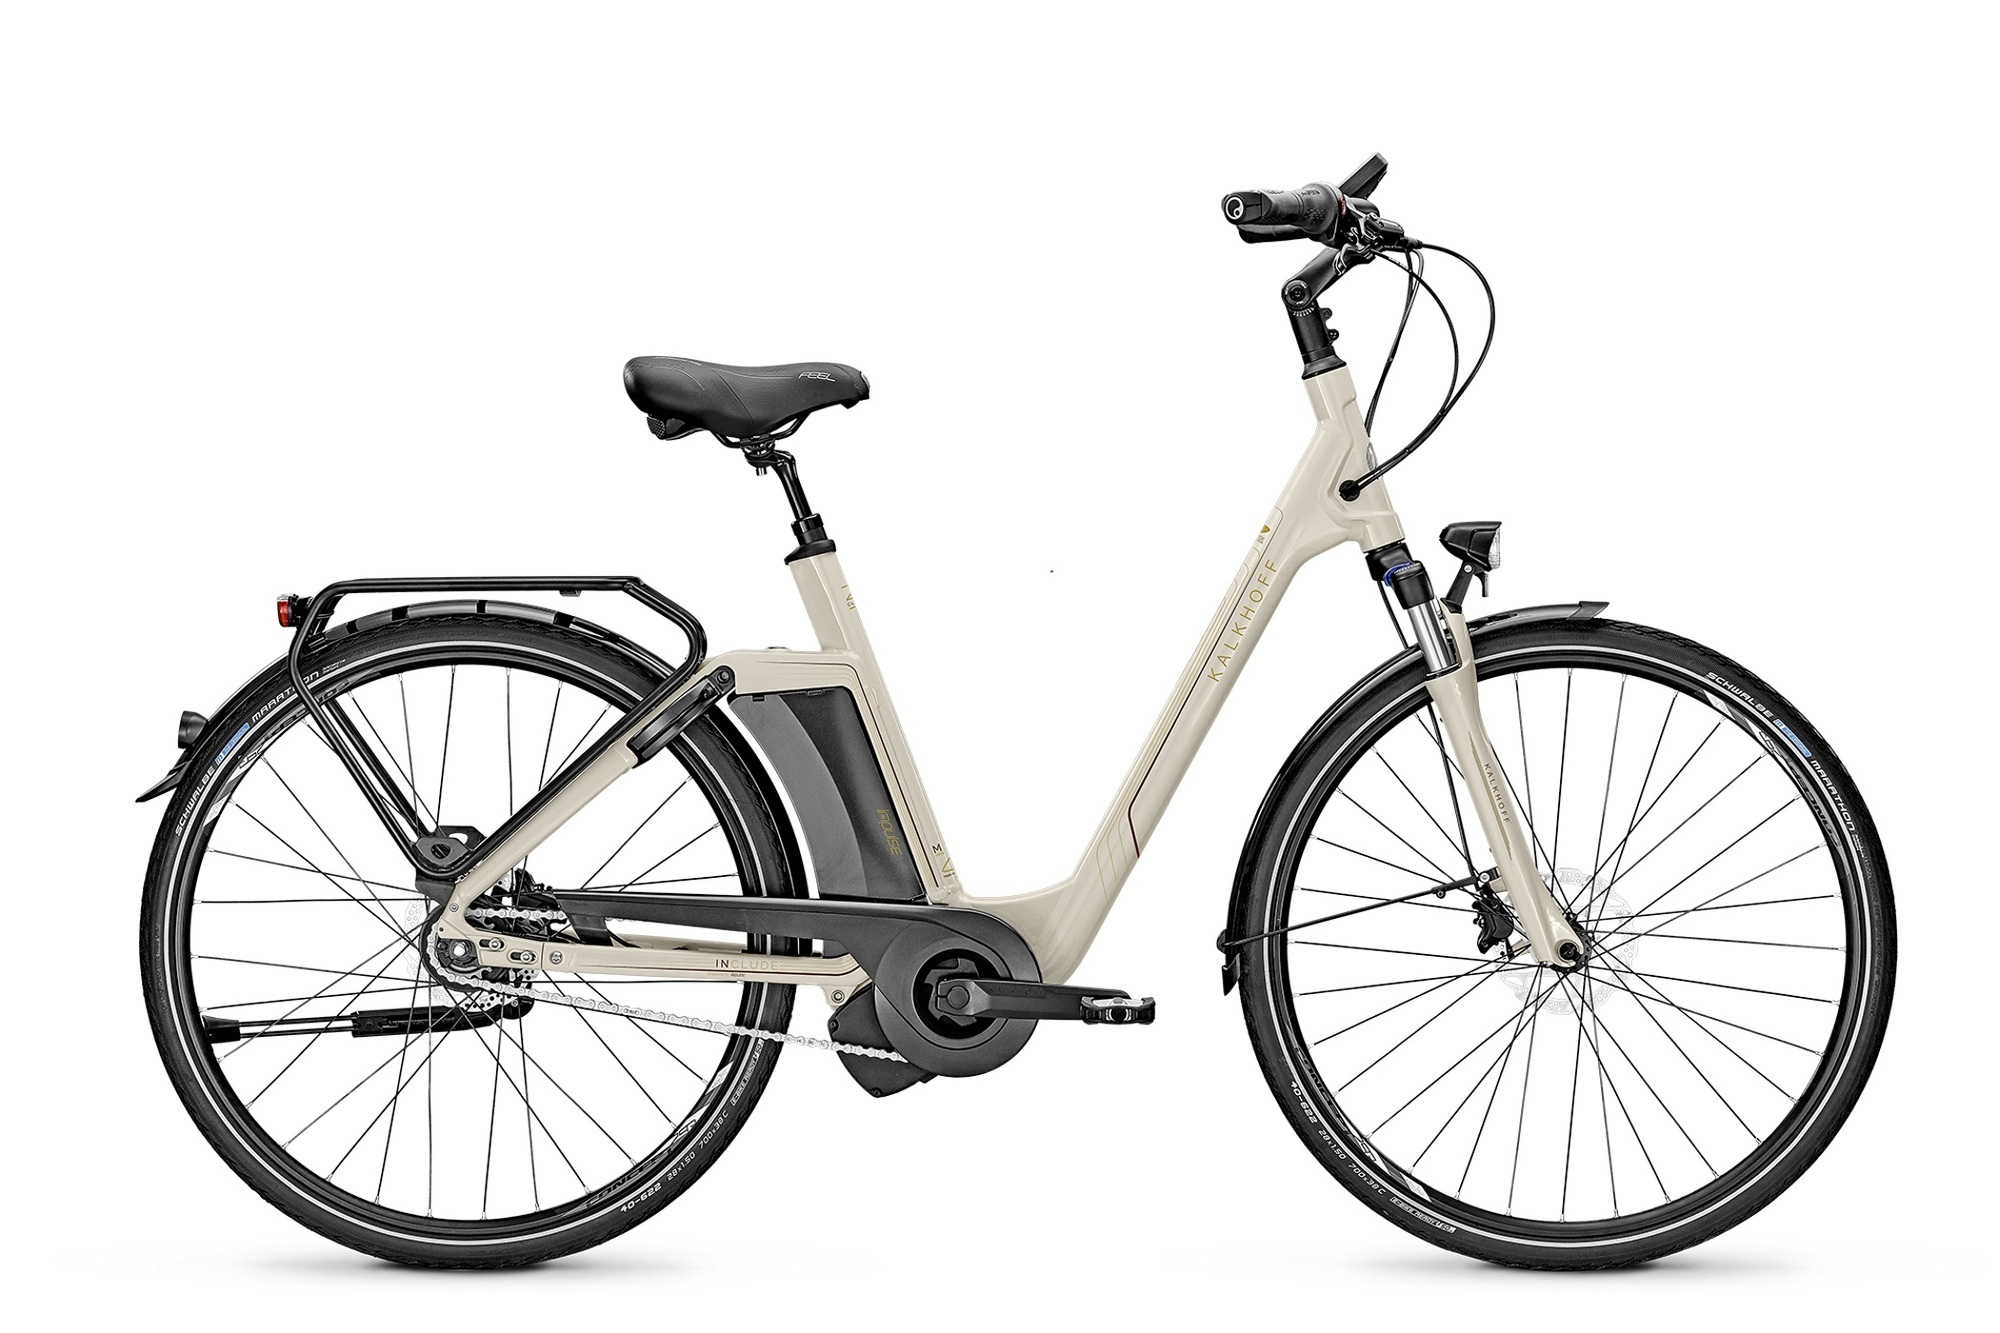 Neue E-Bikes - Bis zu 200 Kilometer stromern